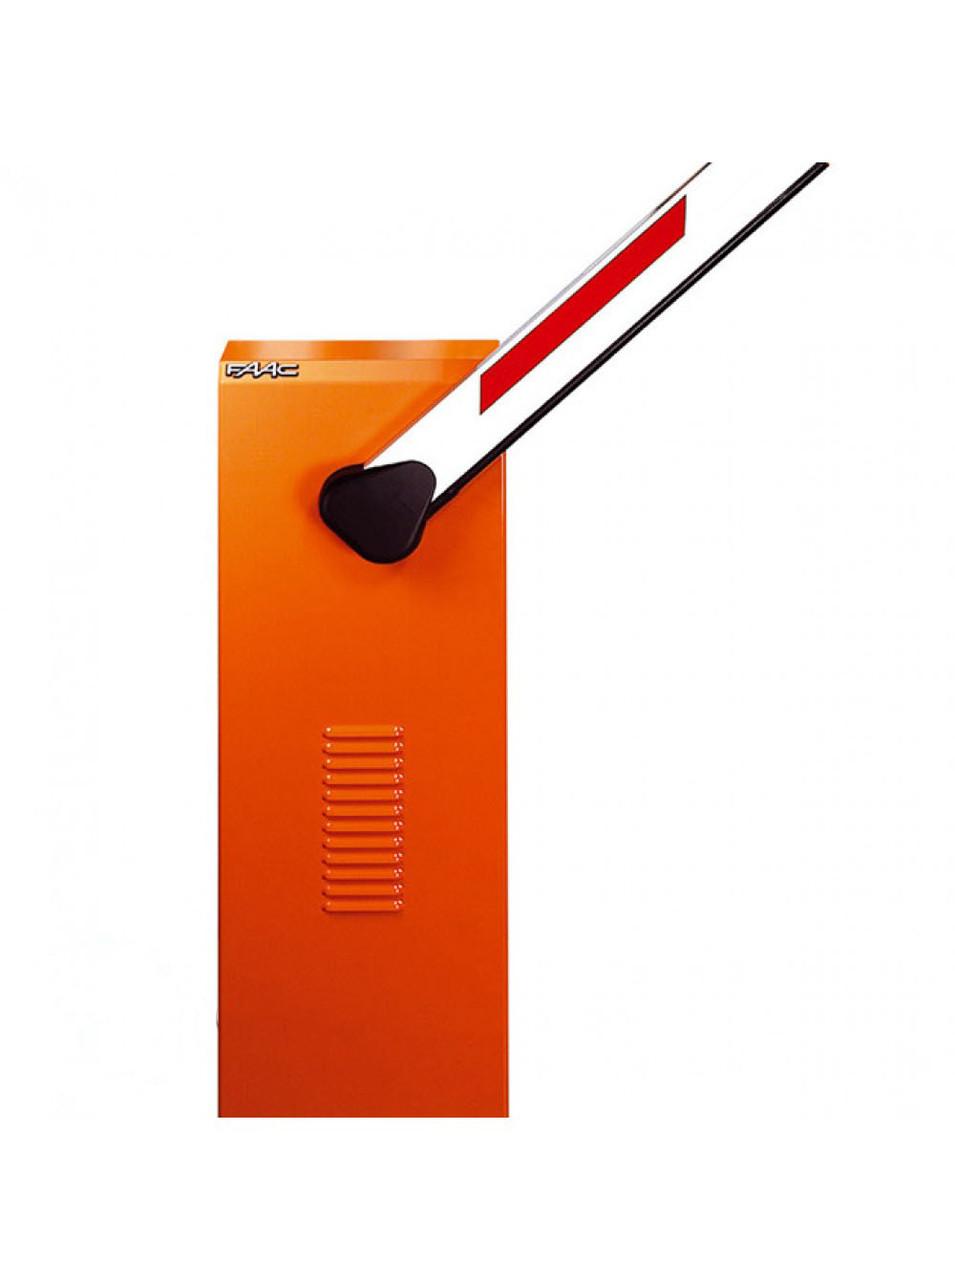 FAAC 620 Standard, стрела 2.315 м с изломом